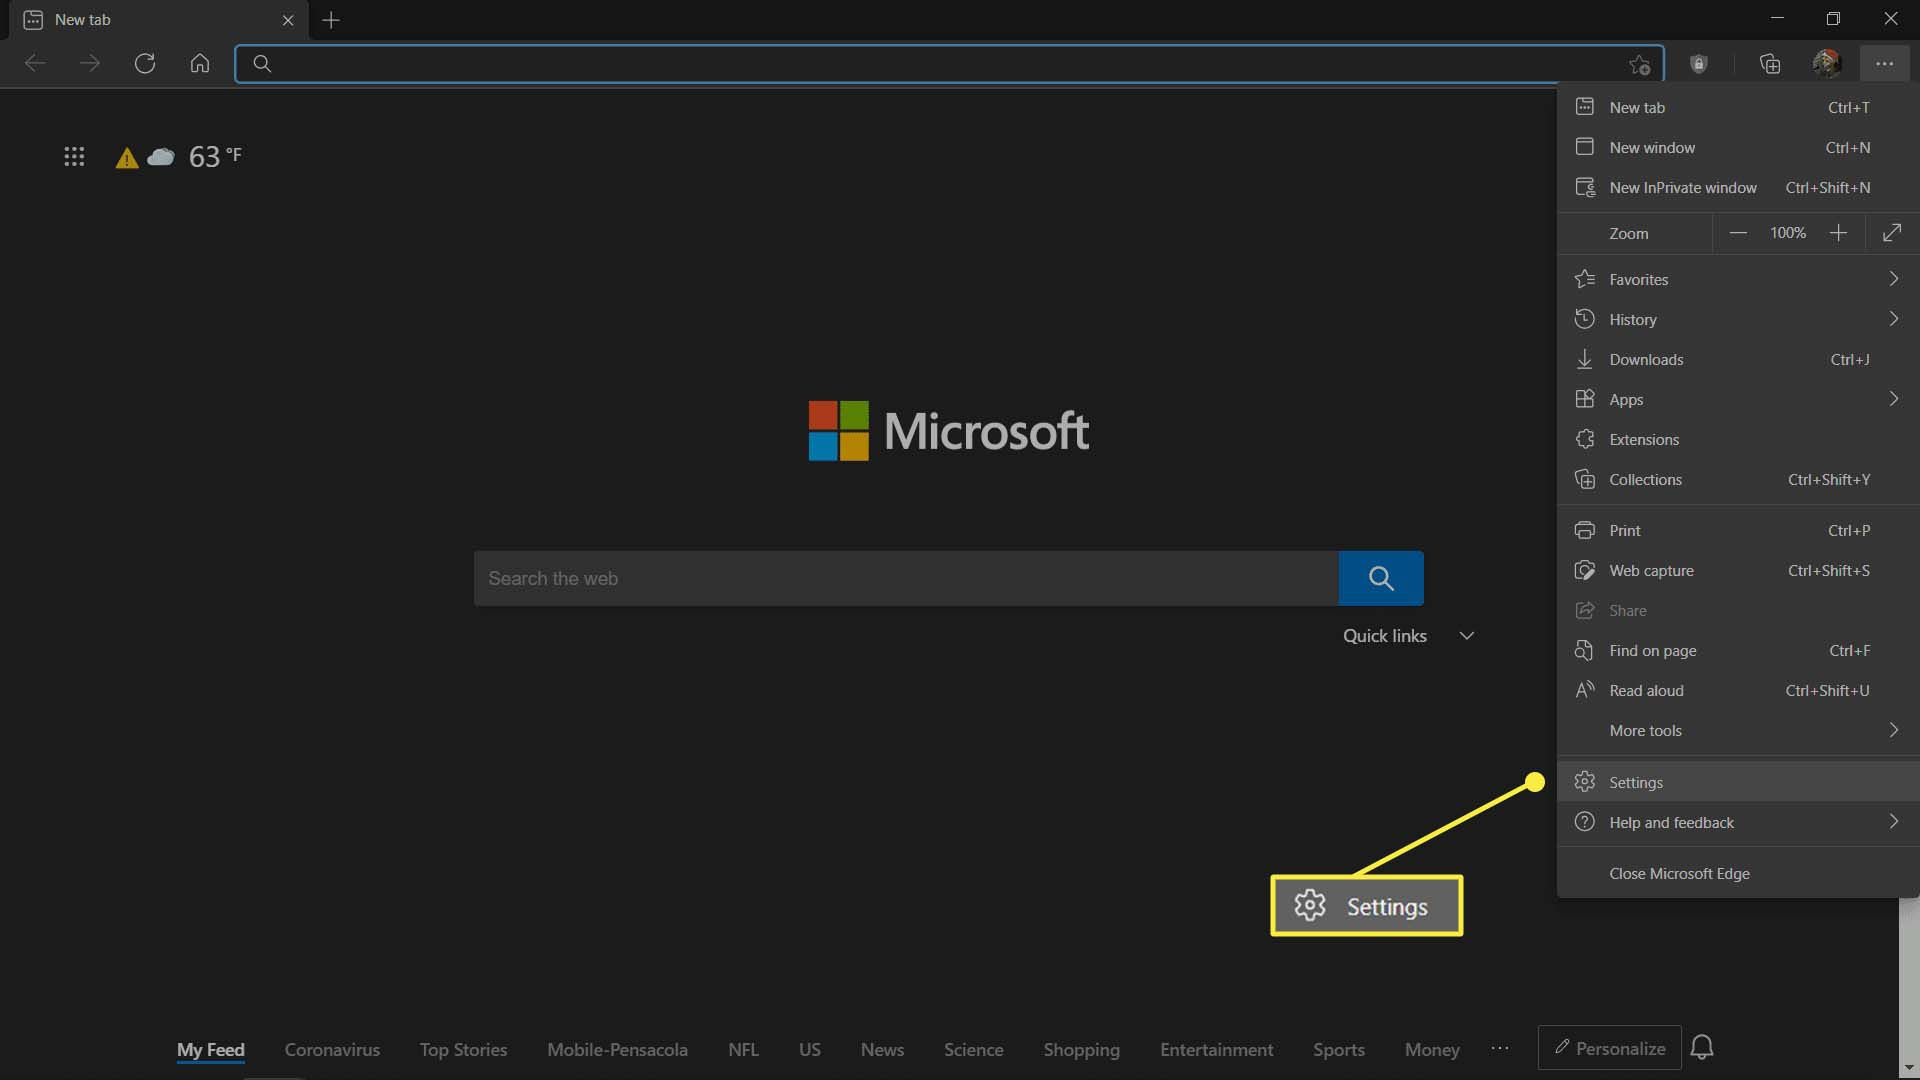 The Microsoft Edge main menu with Settings highlighted.